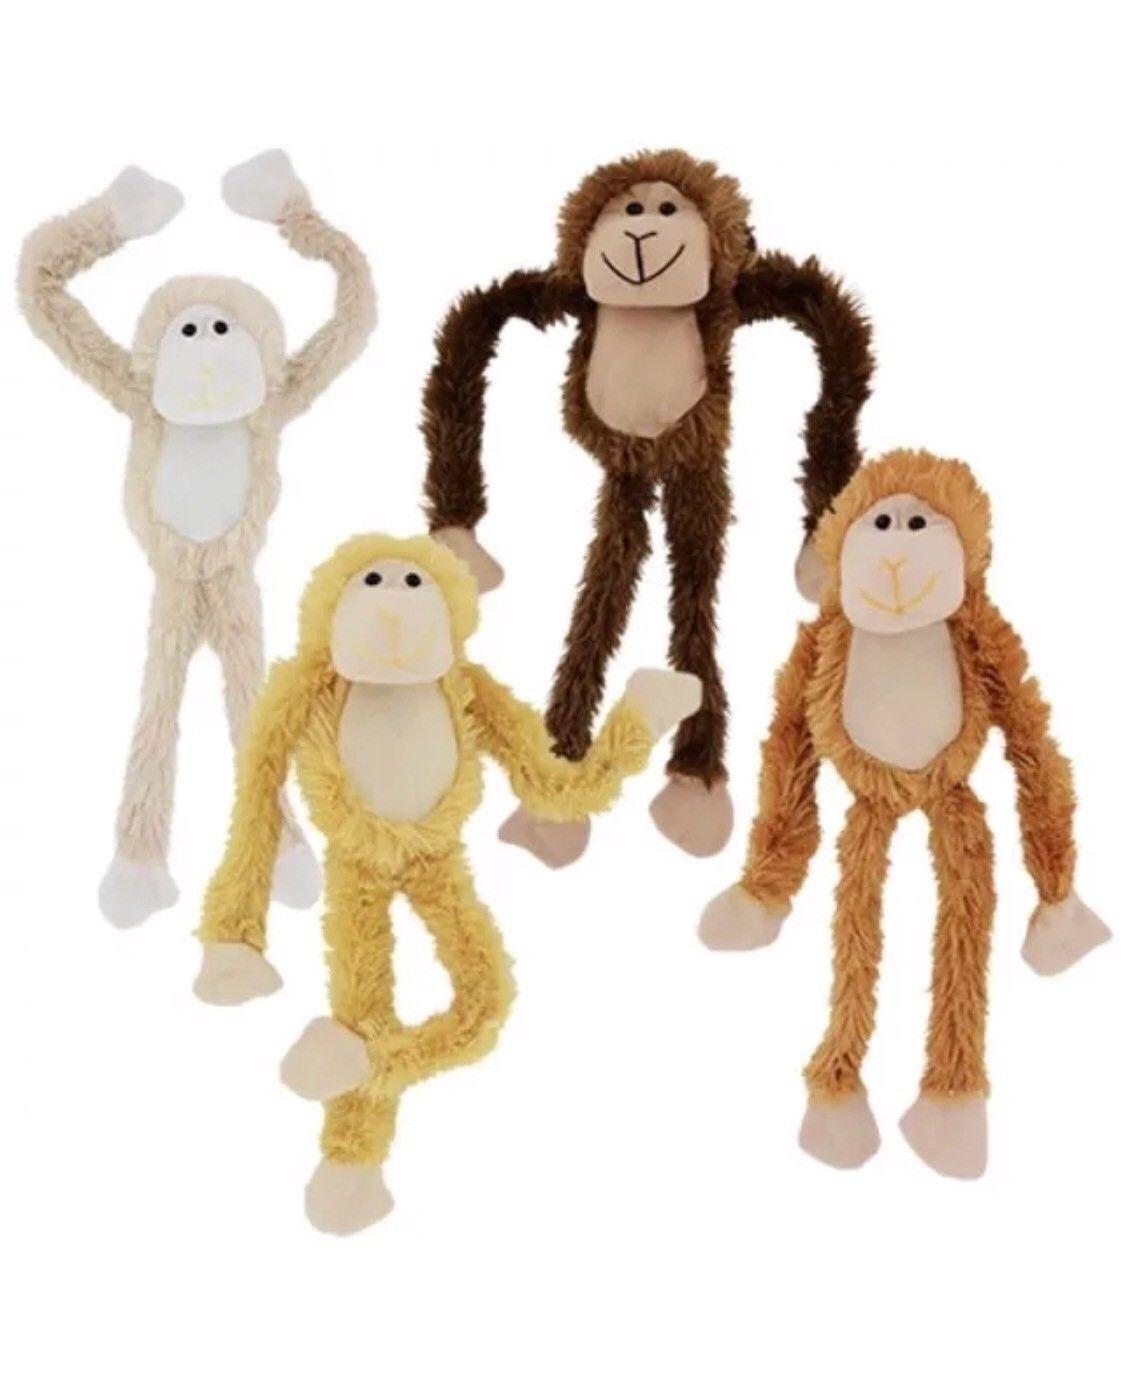 "All 4 Four 18"" Plush Hanging Monkeys Stuffed Animal Monkey Soft ... 5dcde402e"